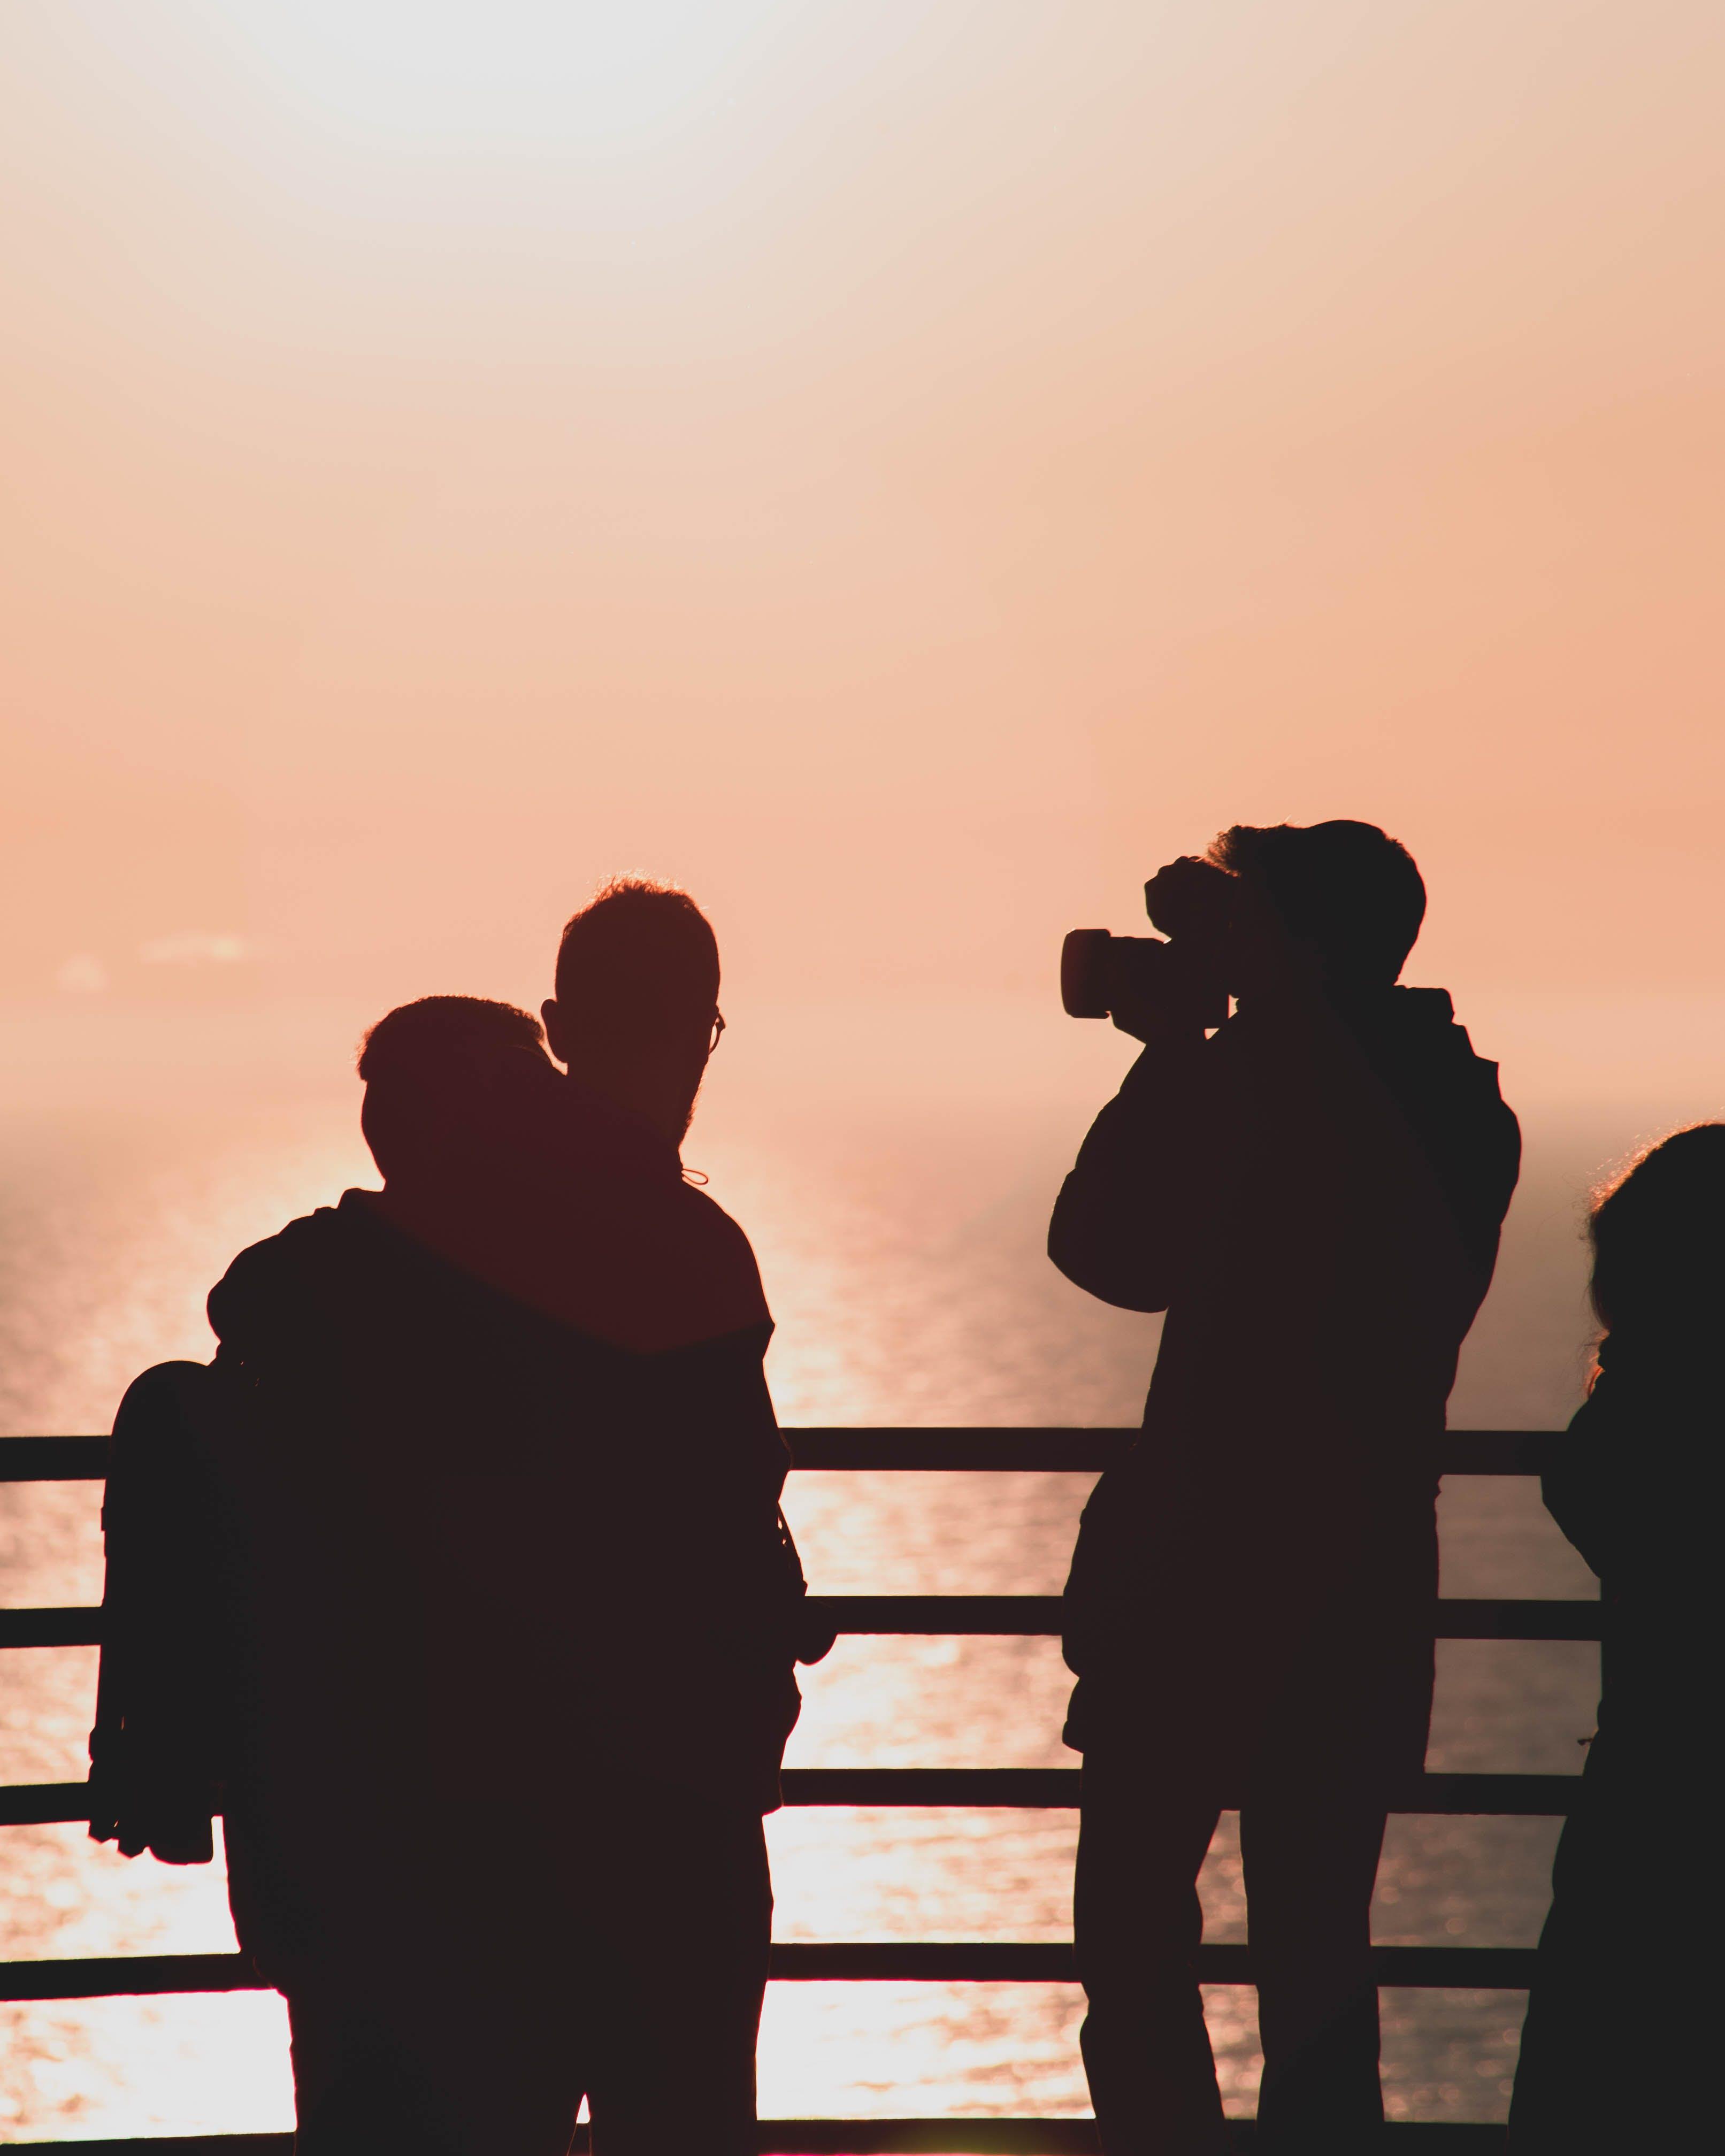 Silhouette Of Man Using Camera